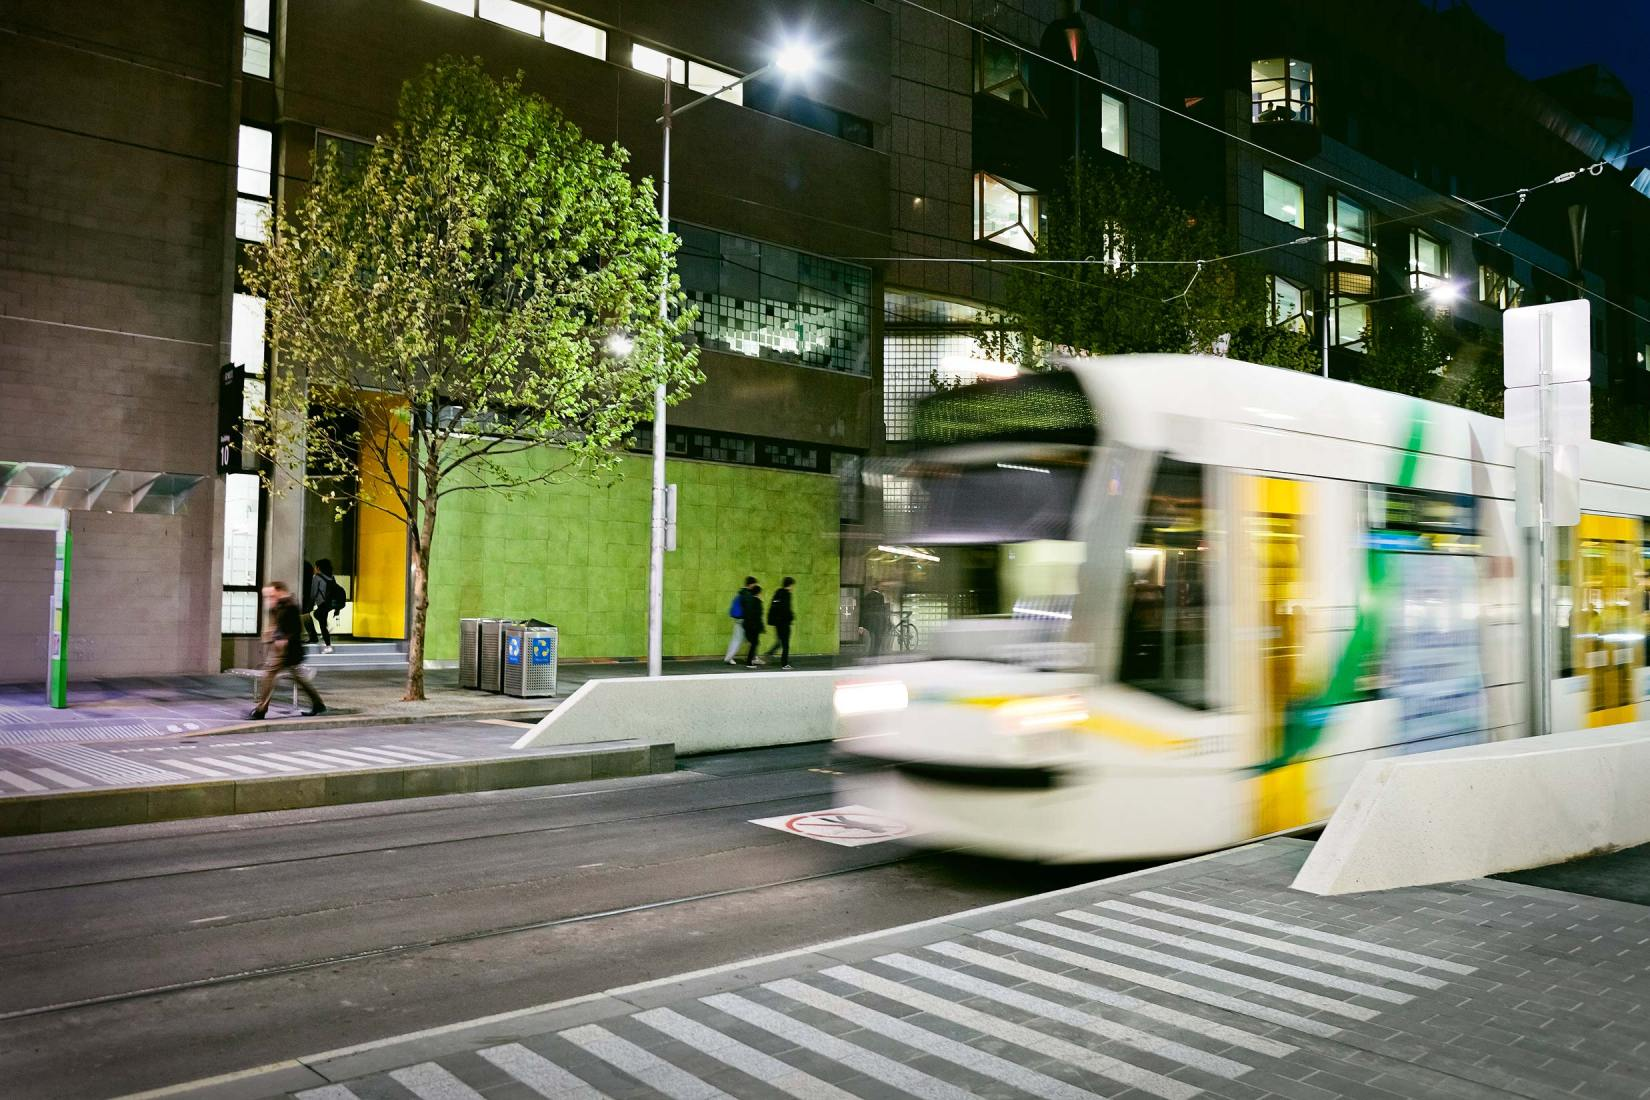 PWS002-028-Image-Workshop-melbourne-photographer-urban-transit-tram